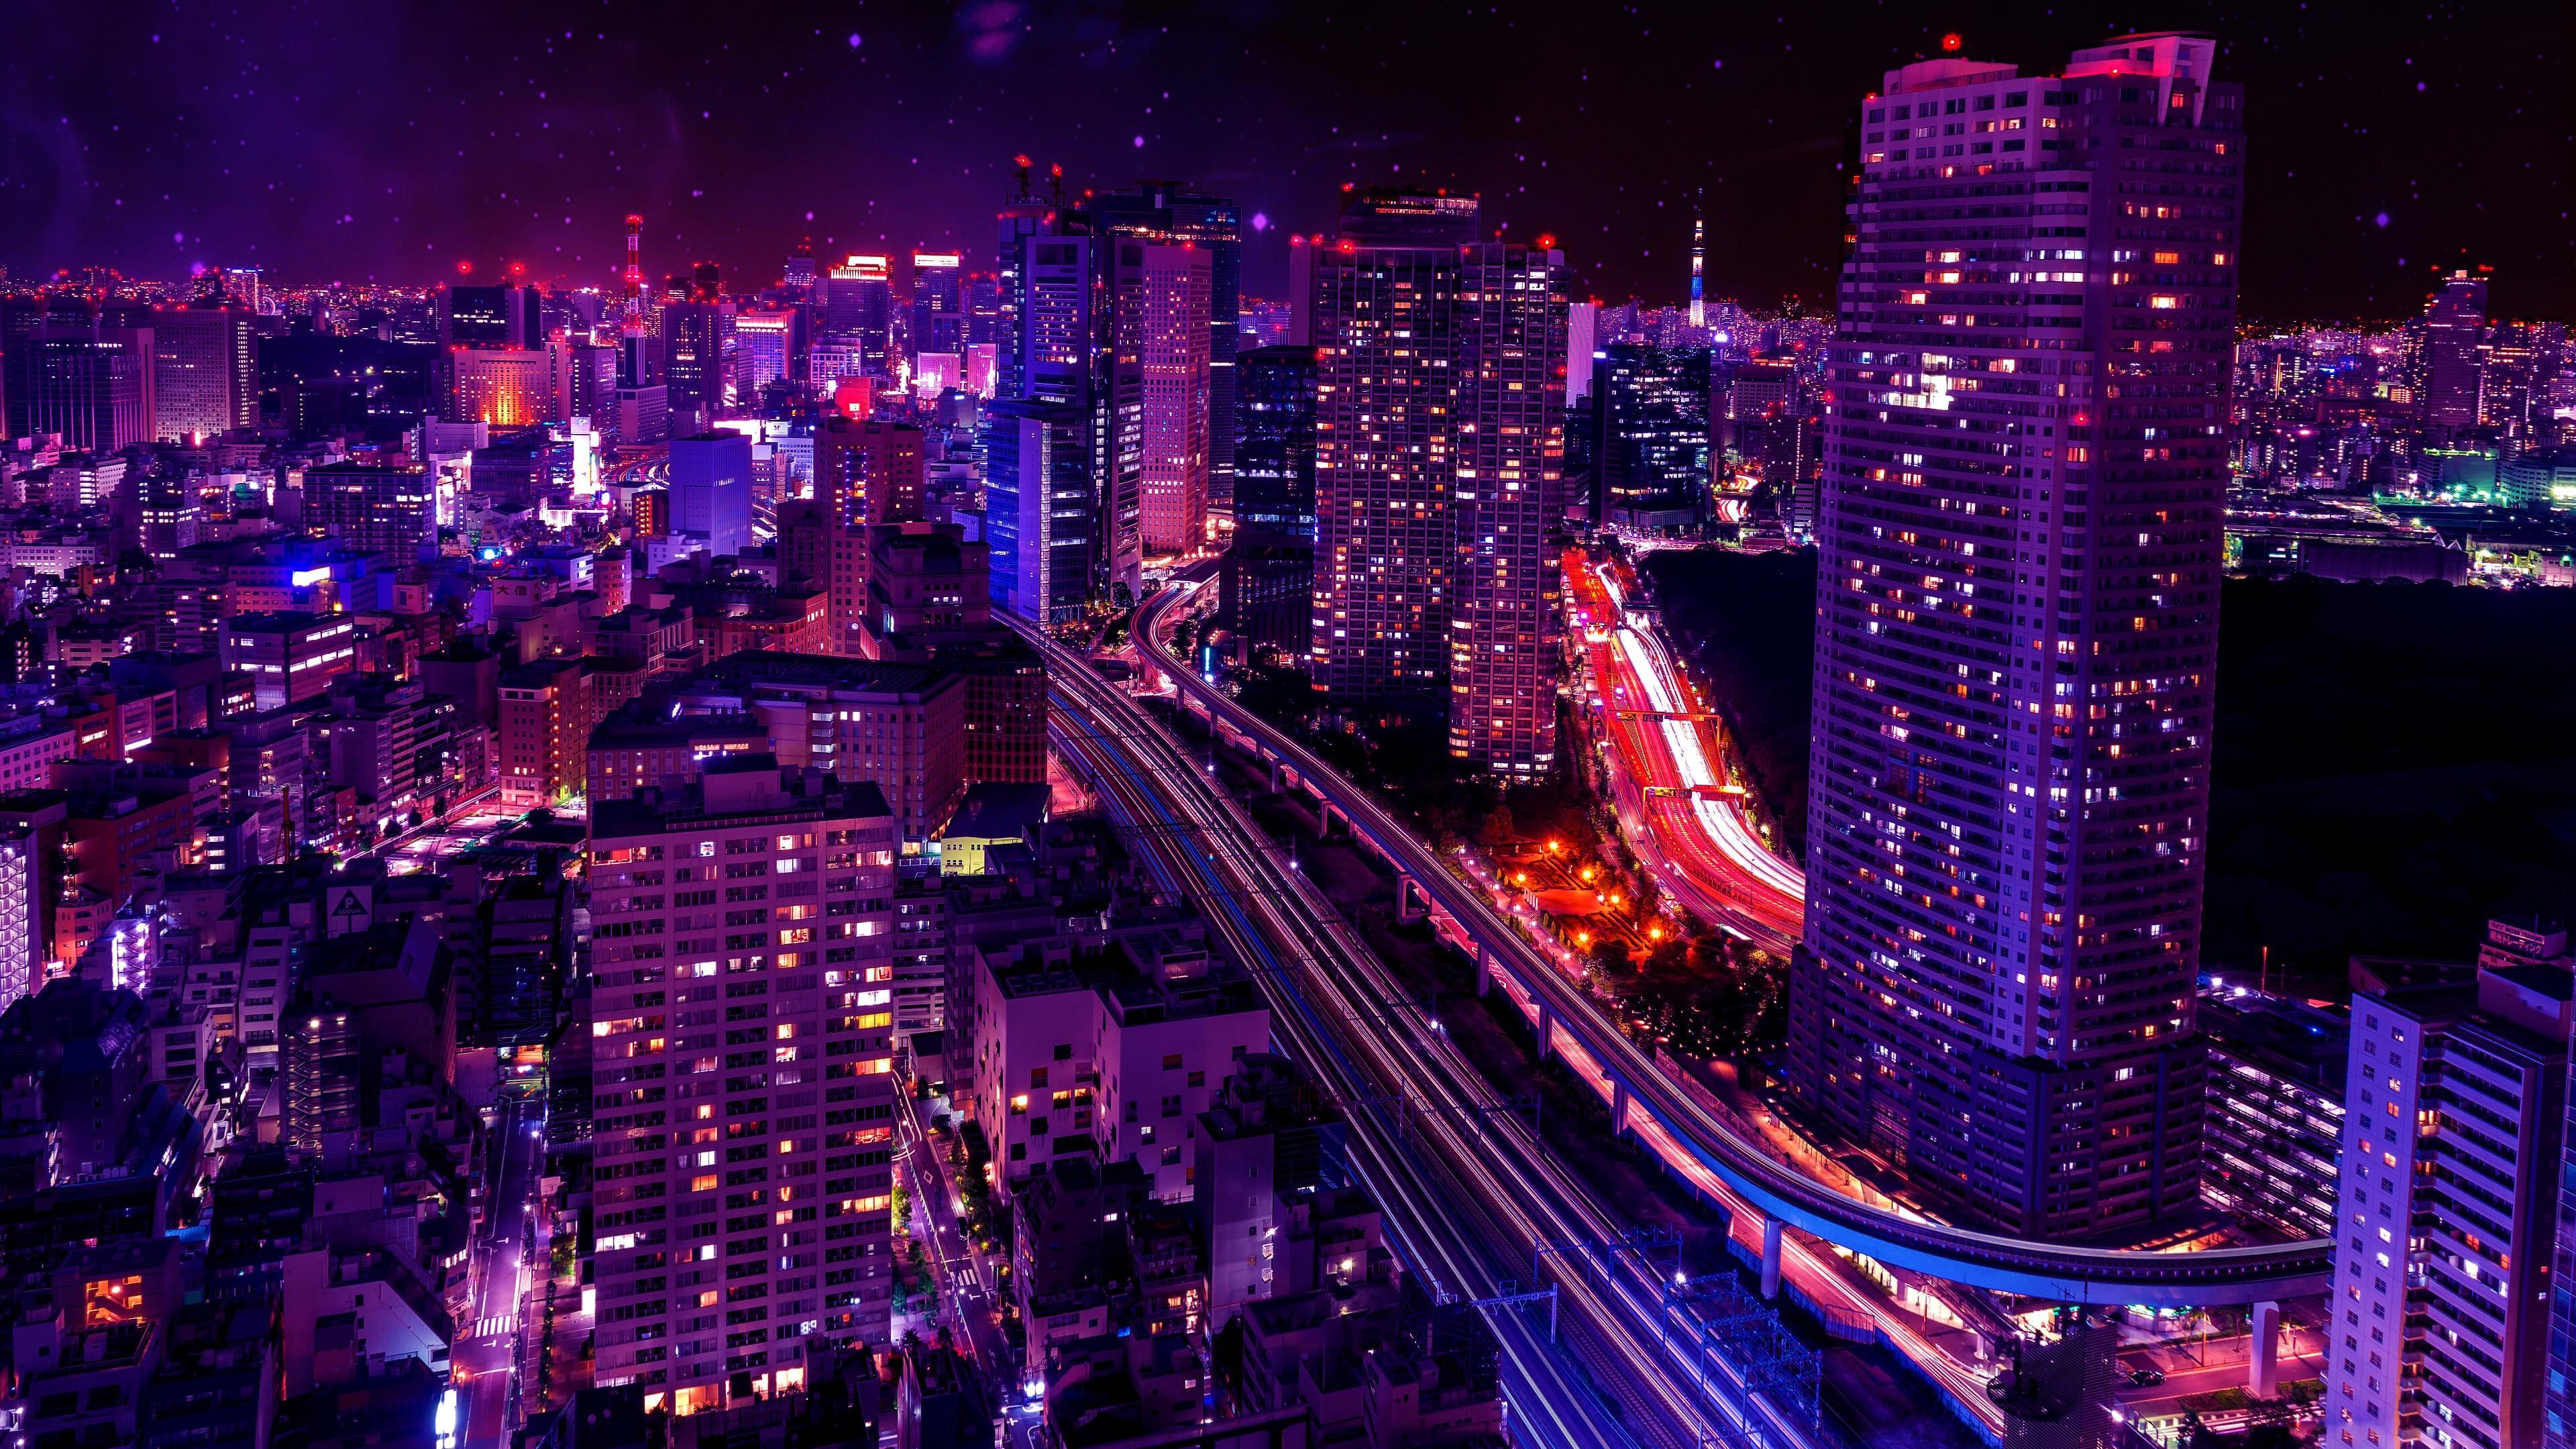 Shiodome Skyline At Night Minato, Tokyo, Japan 4K UltraHD Wallpaper